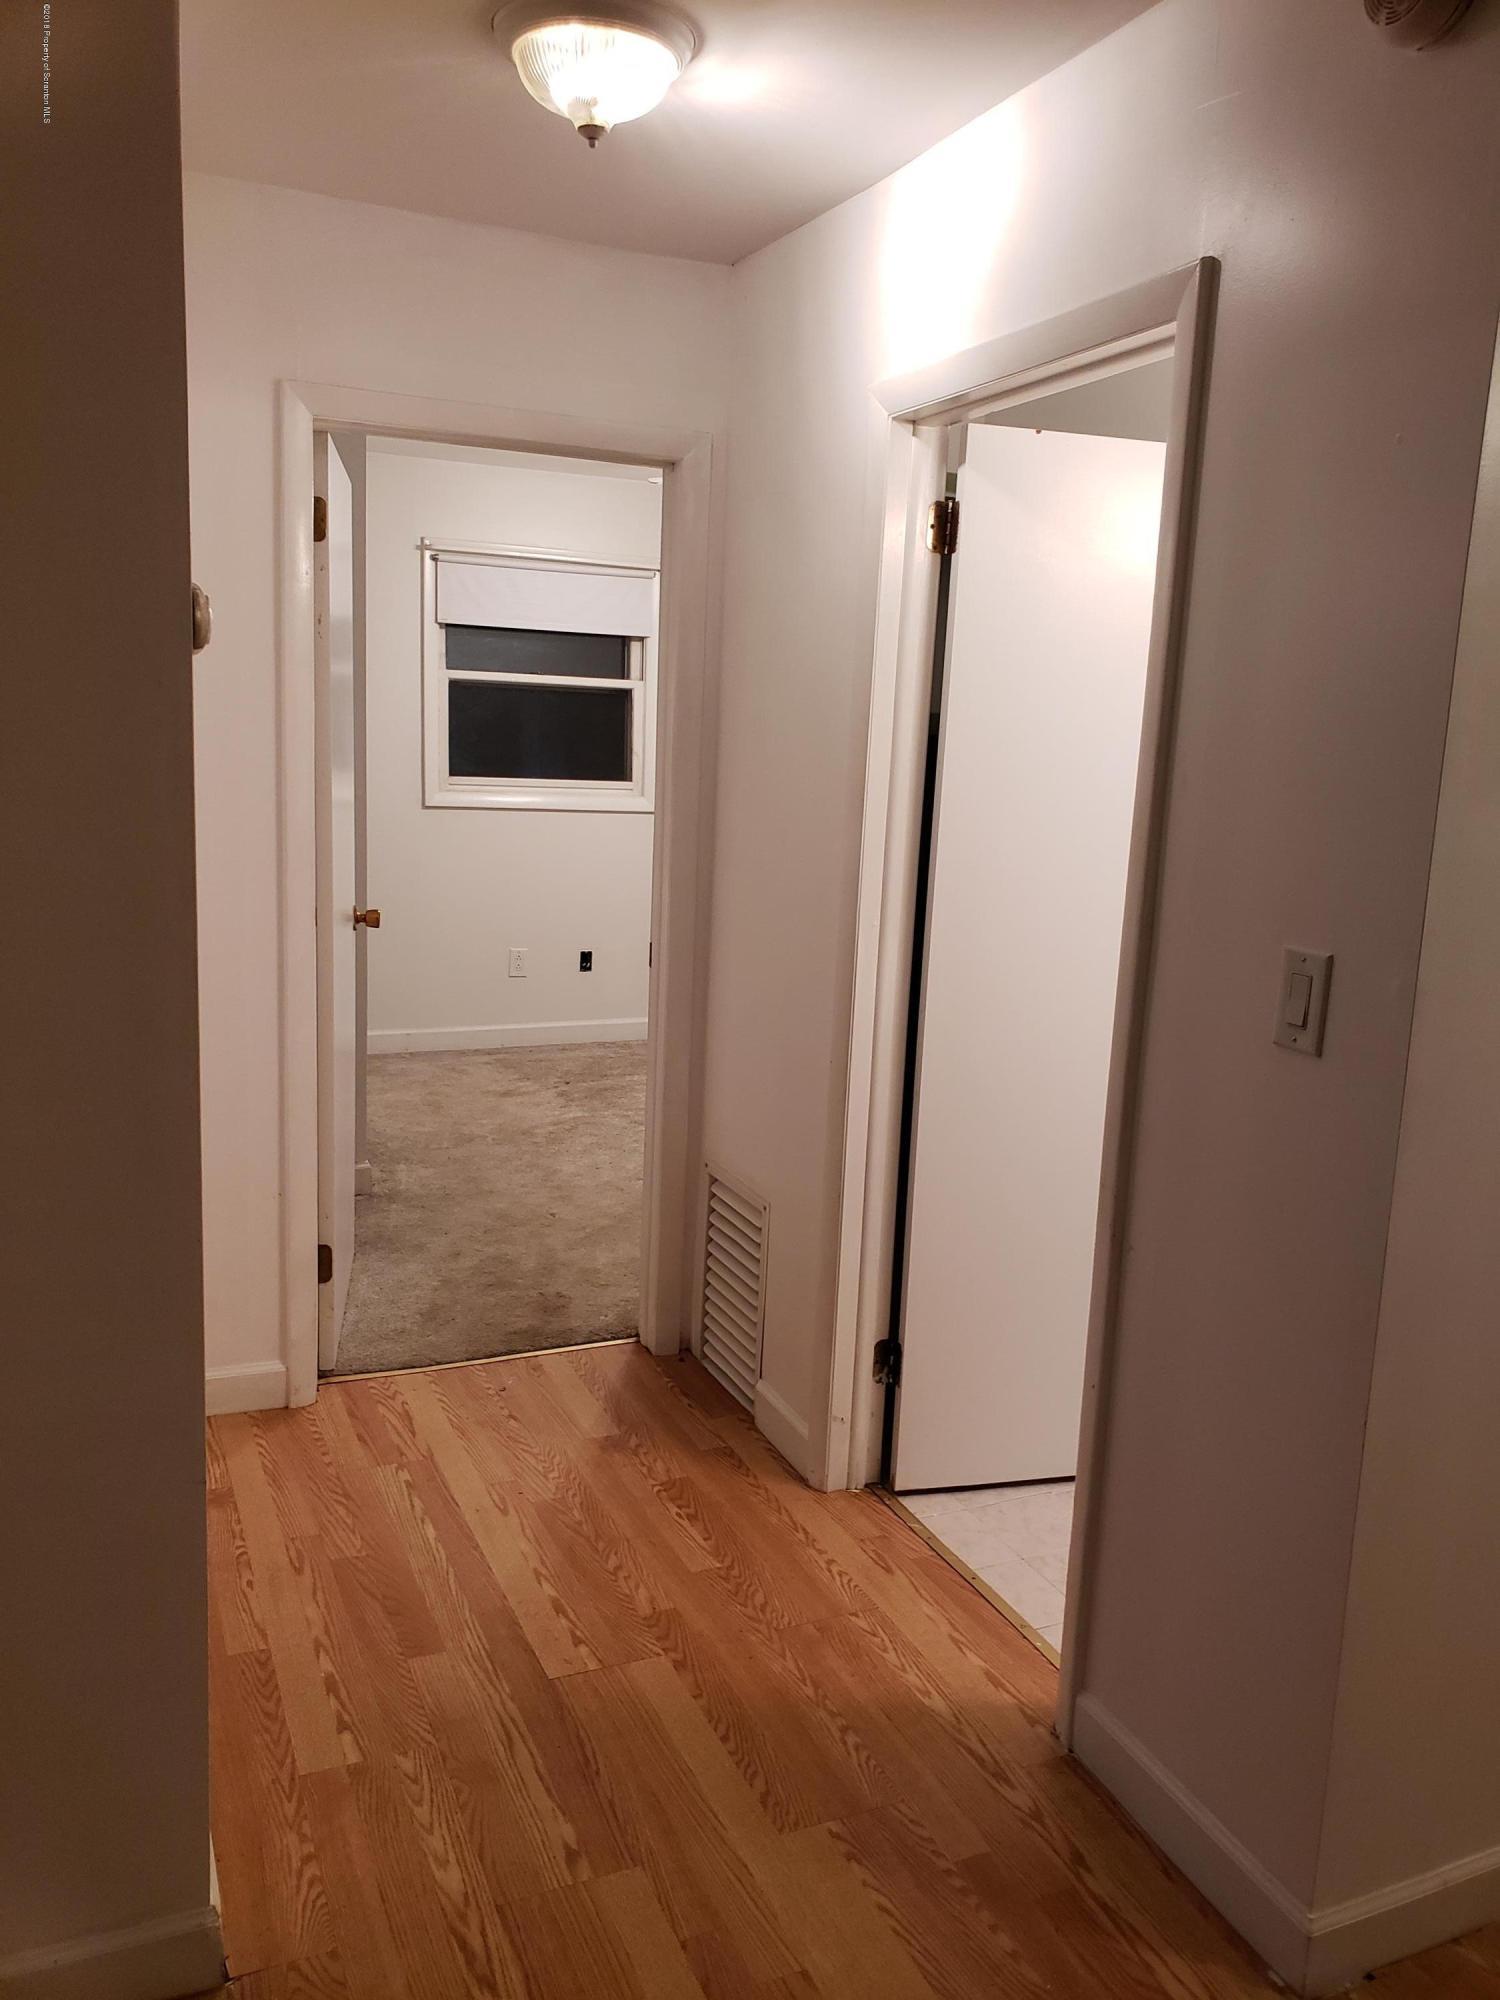 2148 Germantown Rd, Susquehanna, Pennsylvania 18847, 2 Bedrooms Bedrooms, 4 Rooms Rooms,1 BathroomBathrooms,Rental,For Lease,Germantown Rd,19-5580